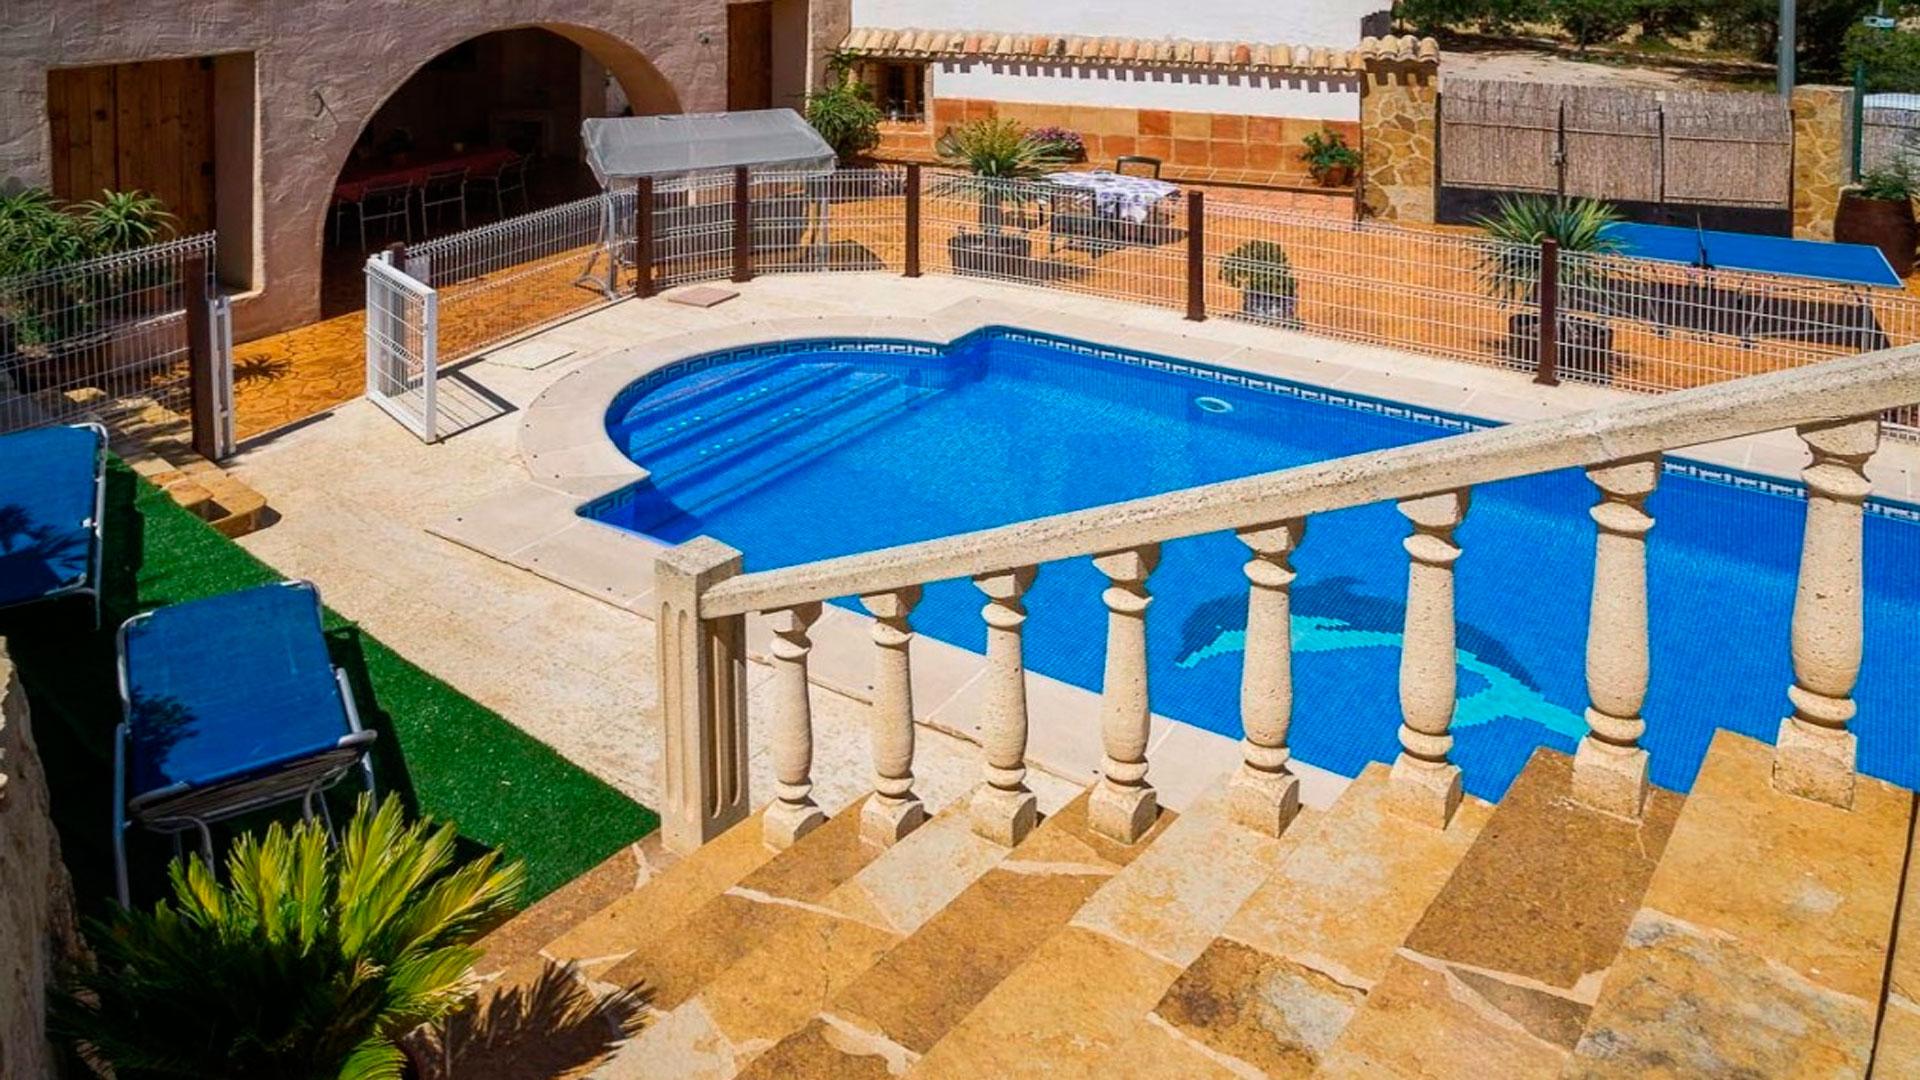 casas rurales en Murcia con piscina